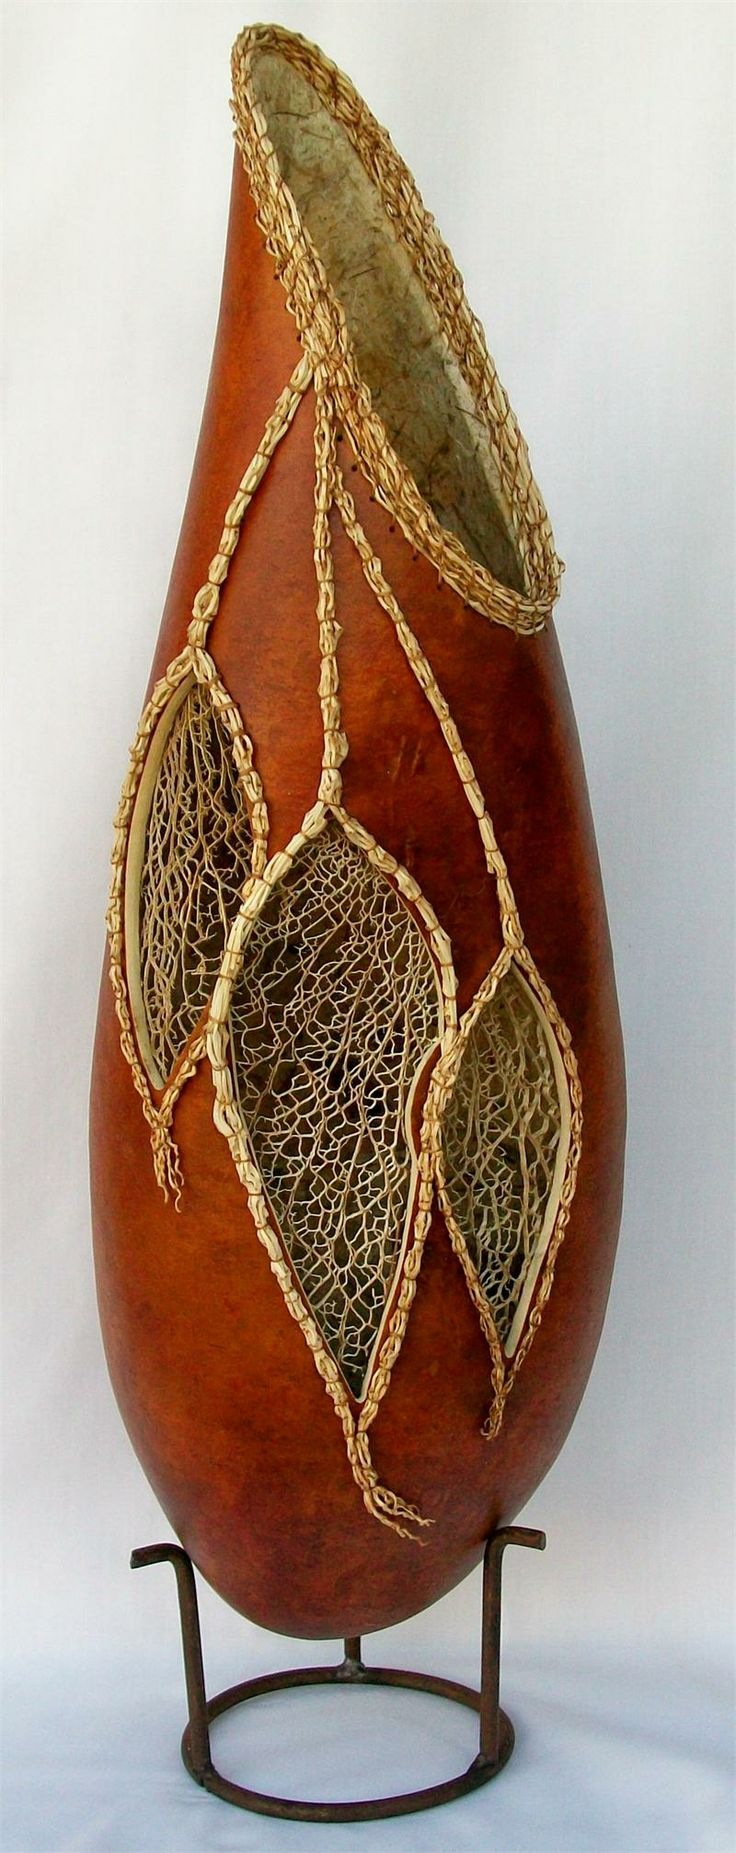 Welburn Gourd Farm Class - Cacti Skeleton Vase with Sue Brogdon